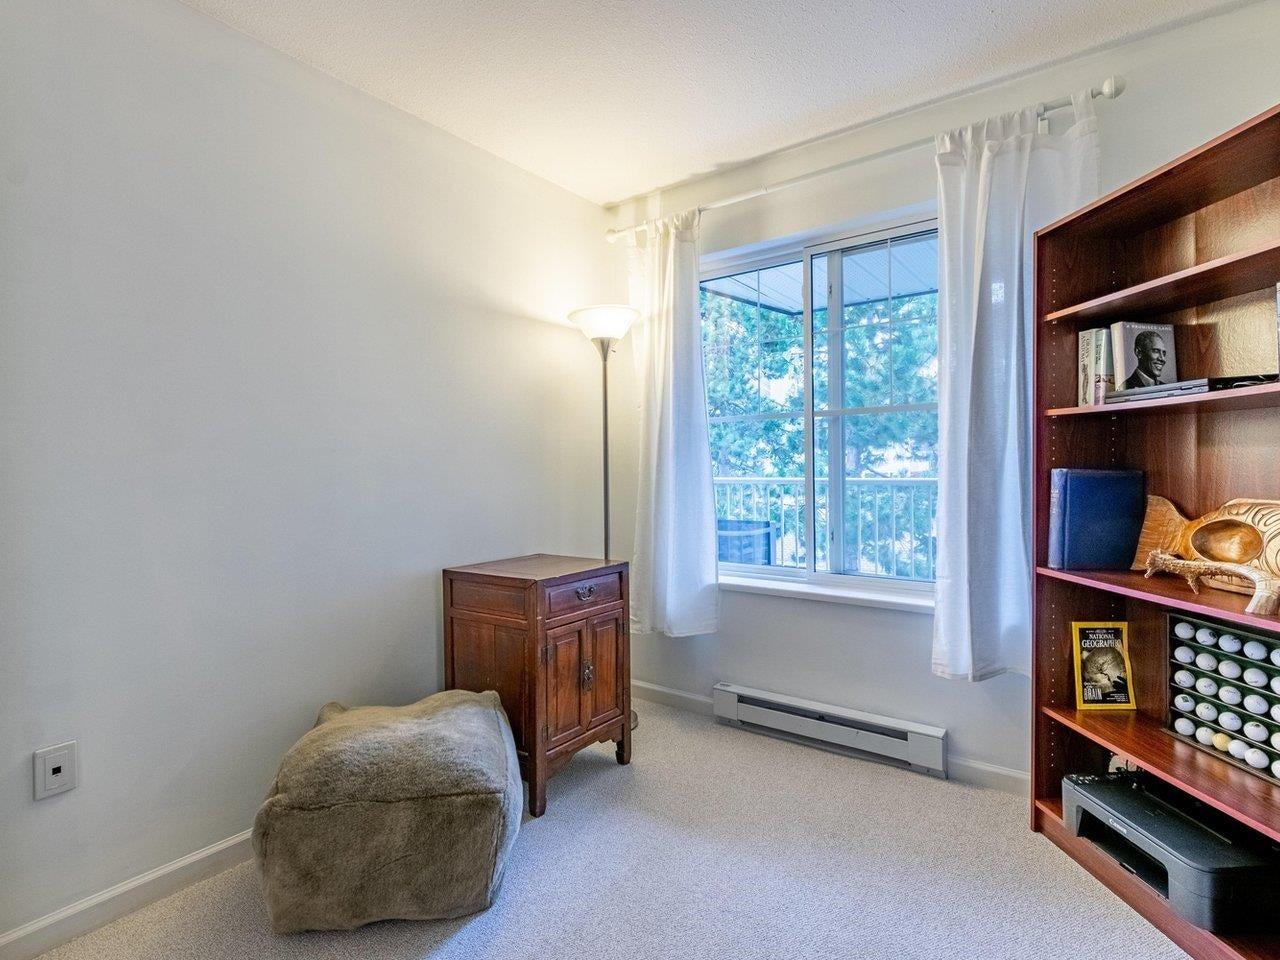 306 15298 20 AVENUE - King George Corridor Apartment/Condo for sale, 2 Bedrooms (R2625551) - #27